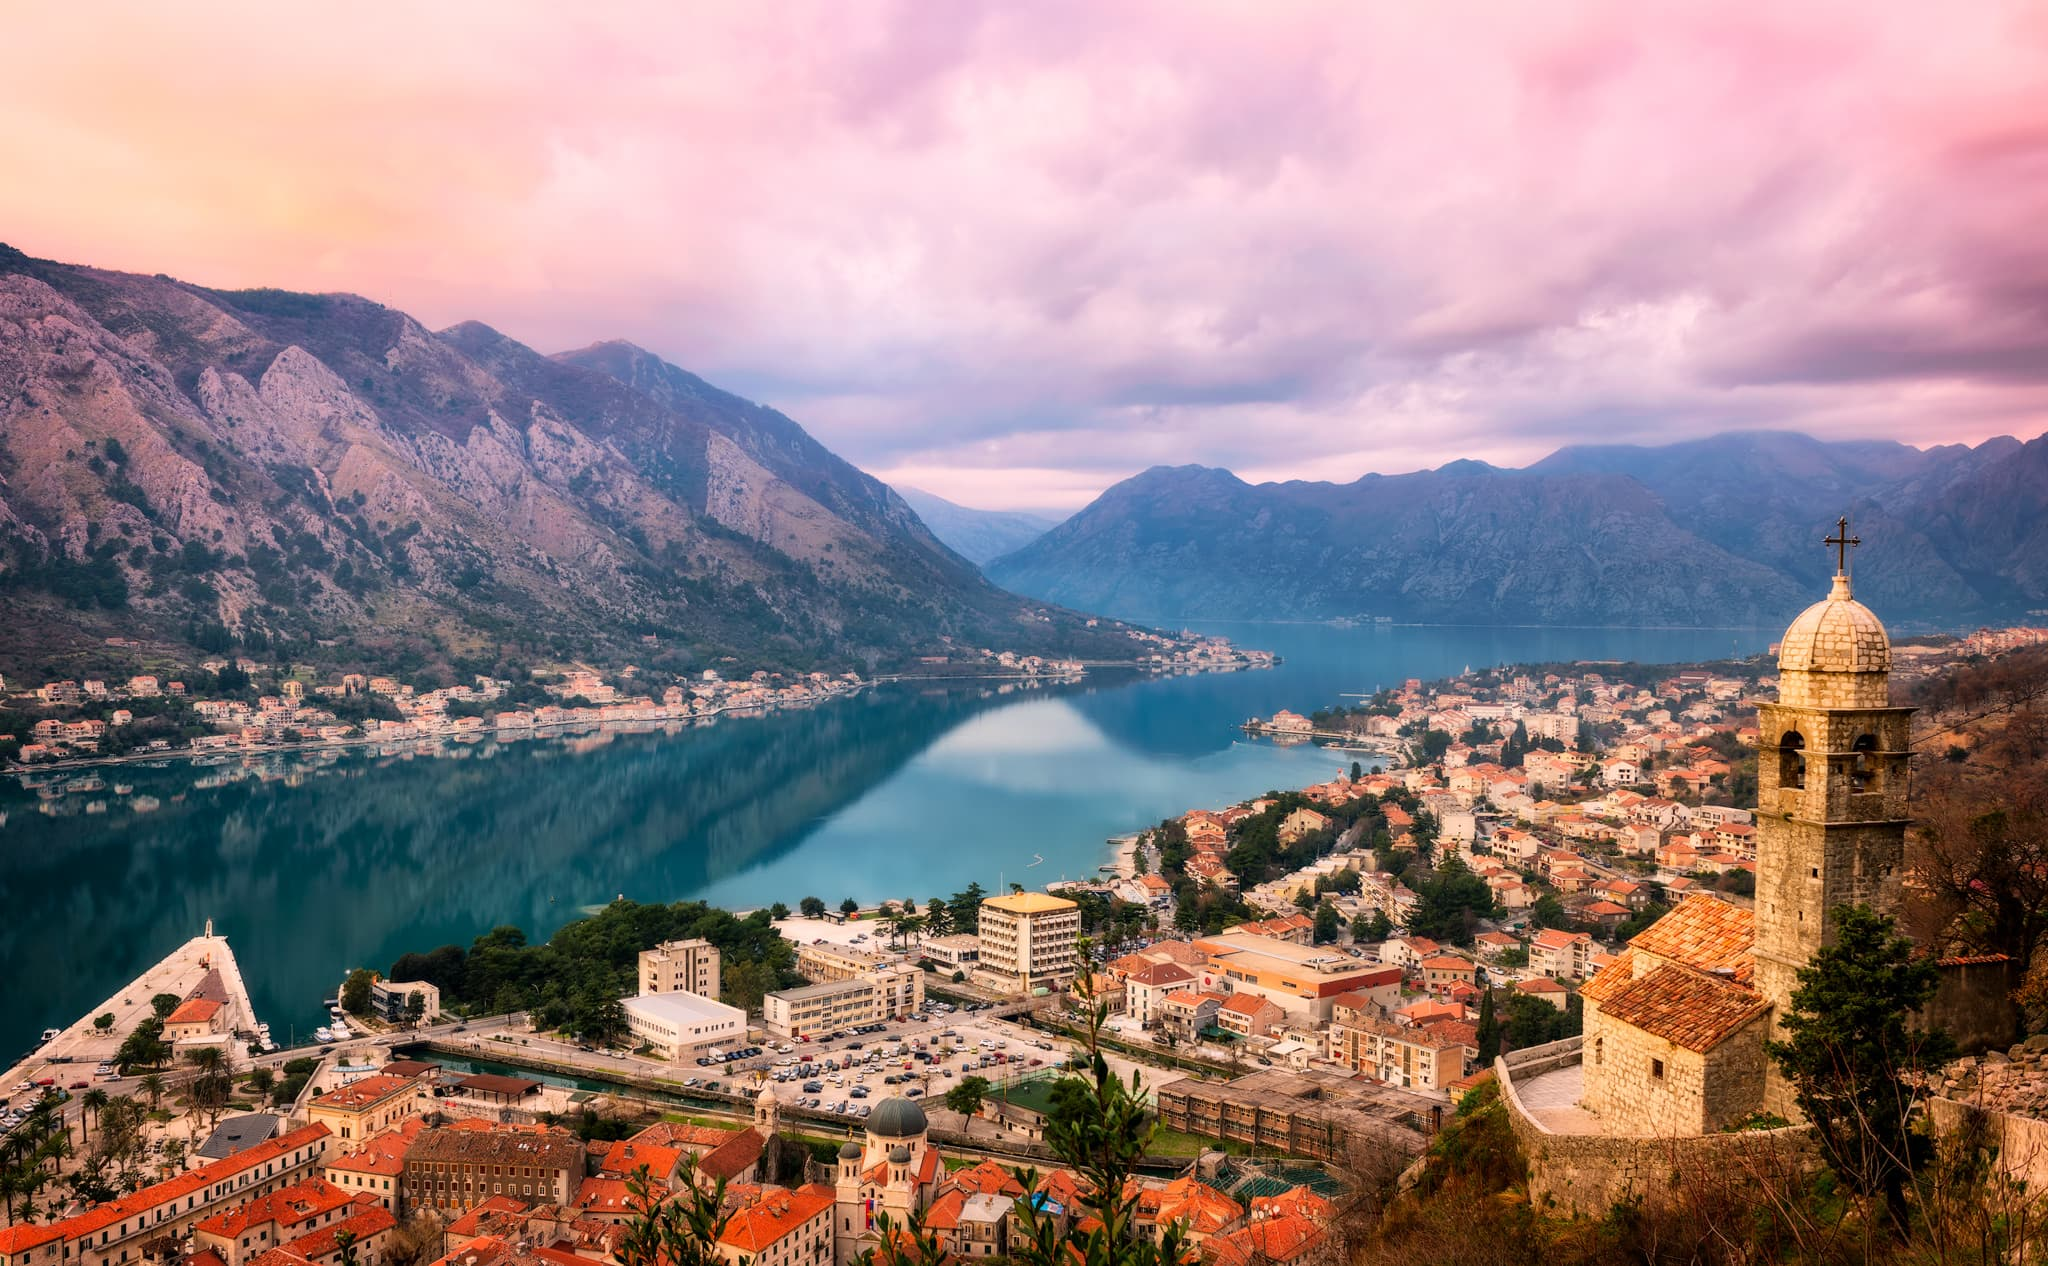 Zatoka Kotorska Sunset Panorama | Kotor, Czarnogóra